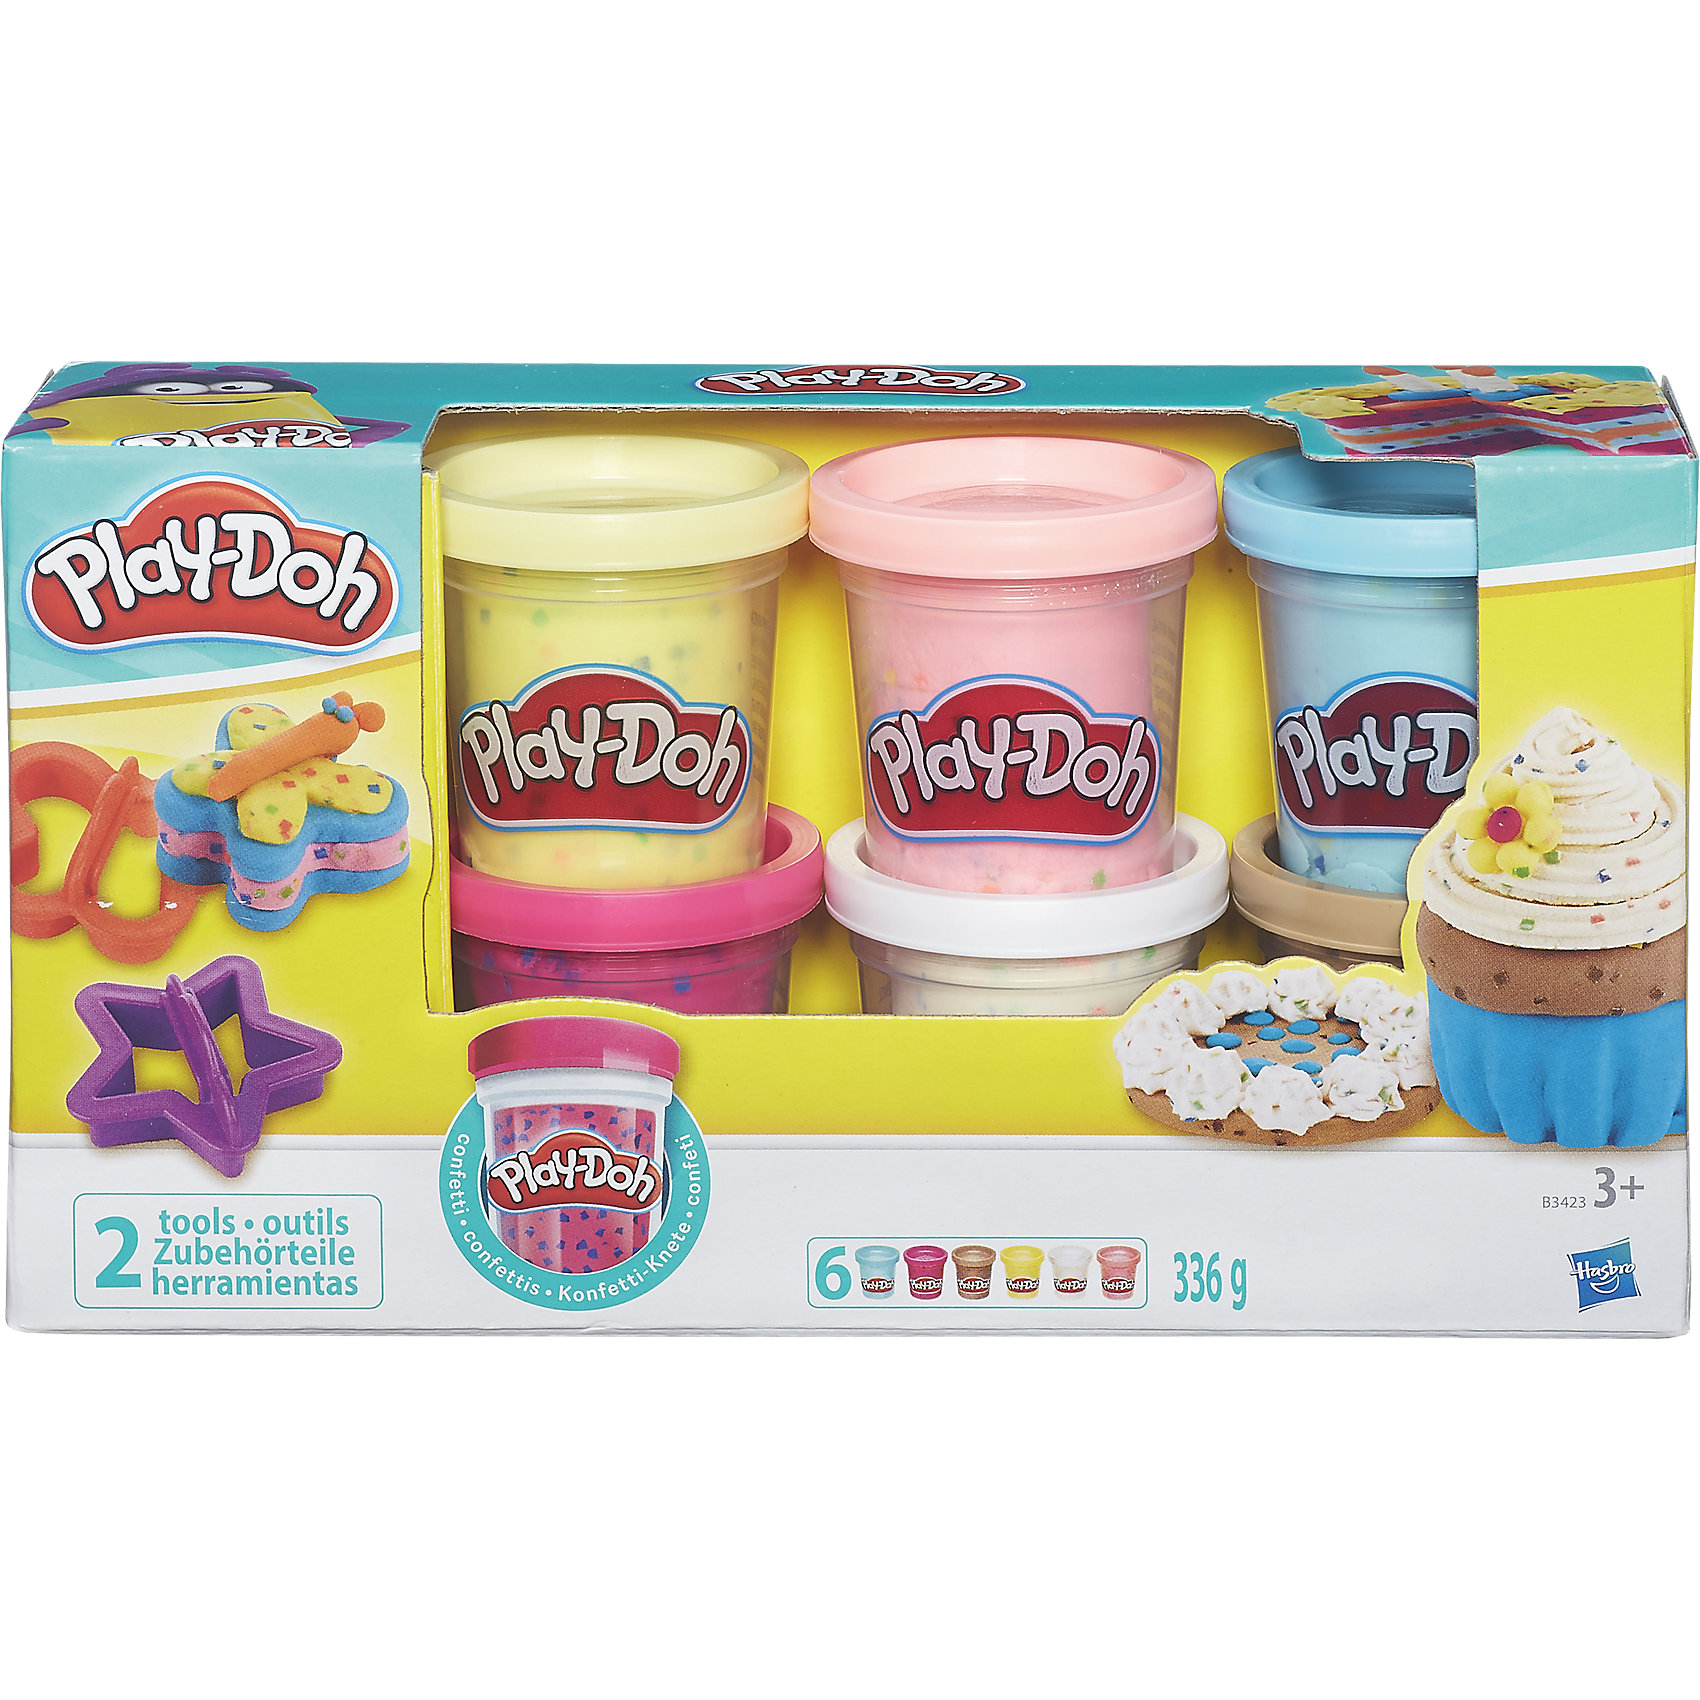 Hasbro Набор из 6 баночек с конфетти, Play-Doh hasbro play doh b5517 игровой набор из 4 баночек в ассортименте обновлённый